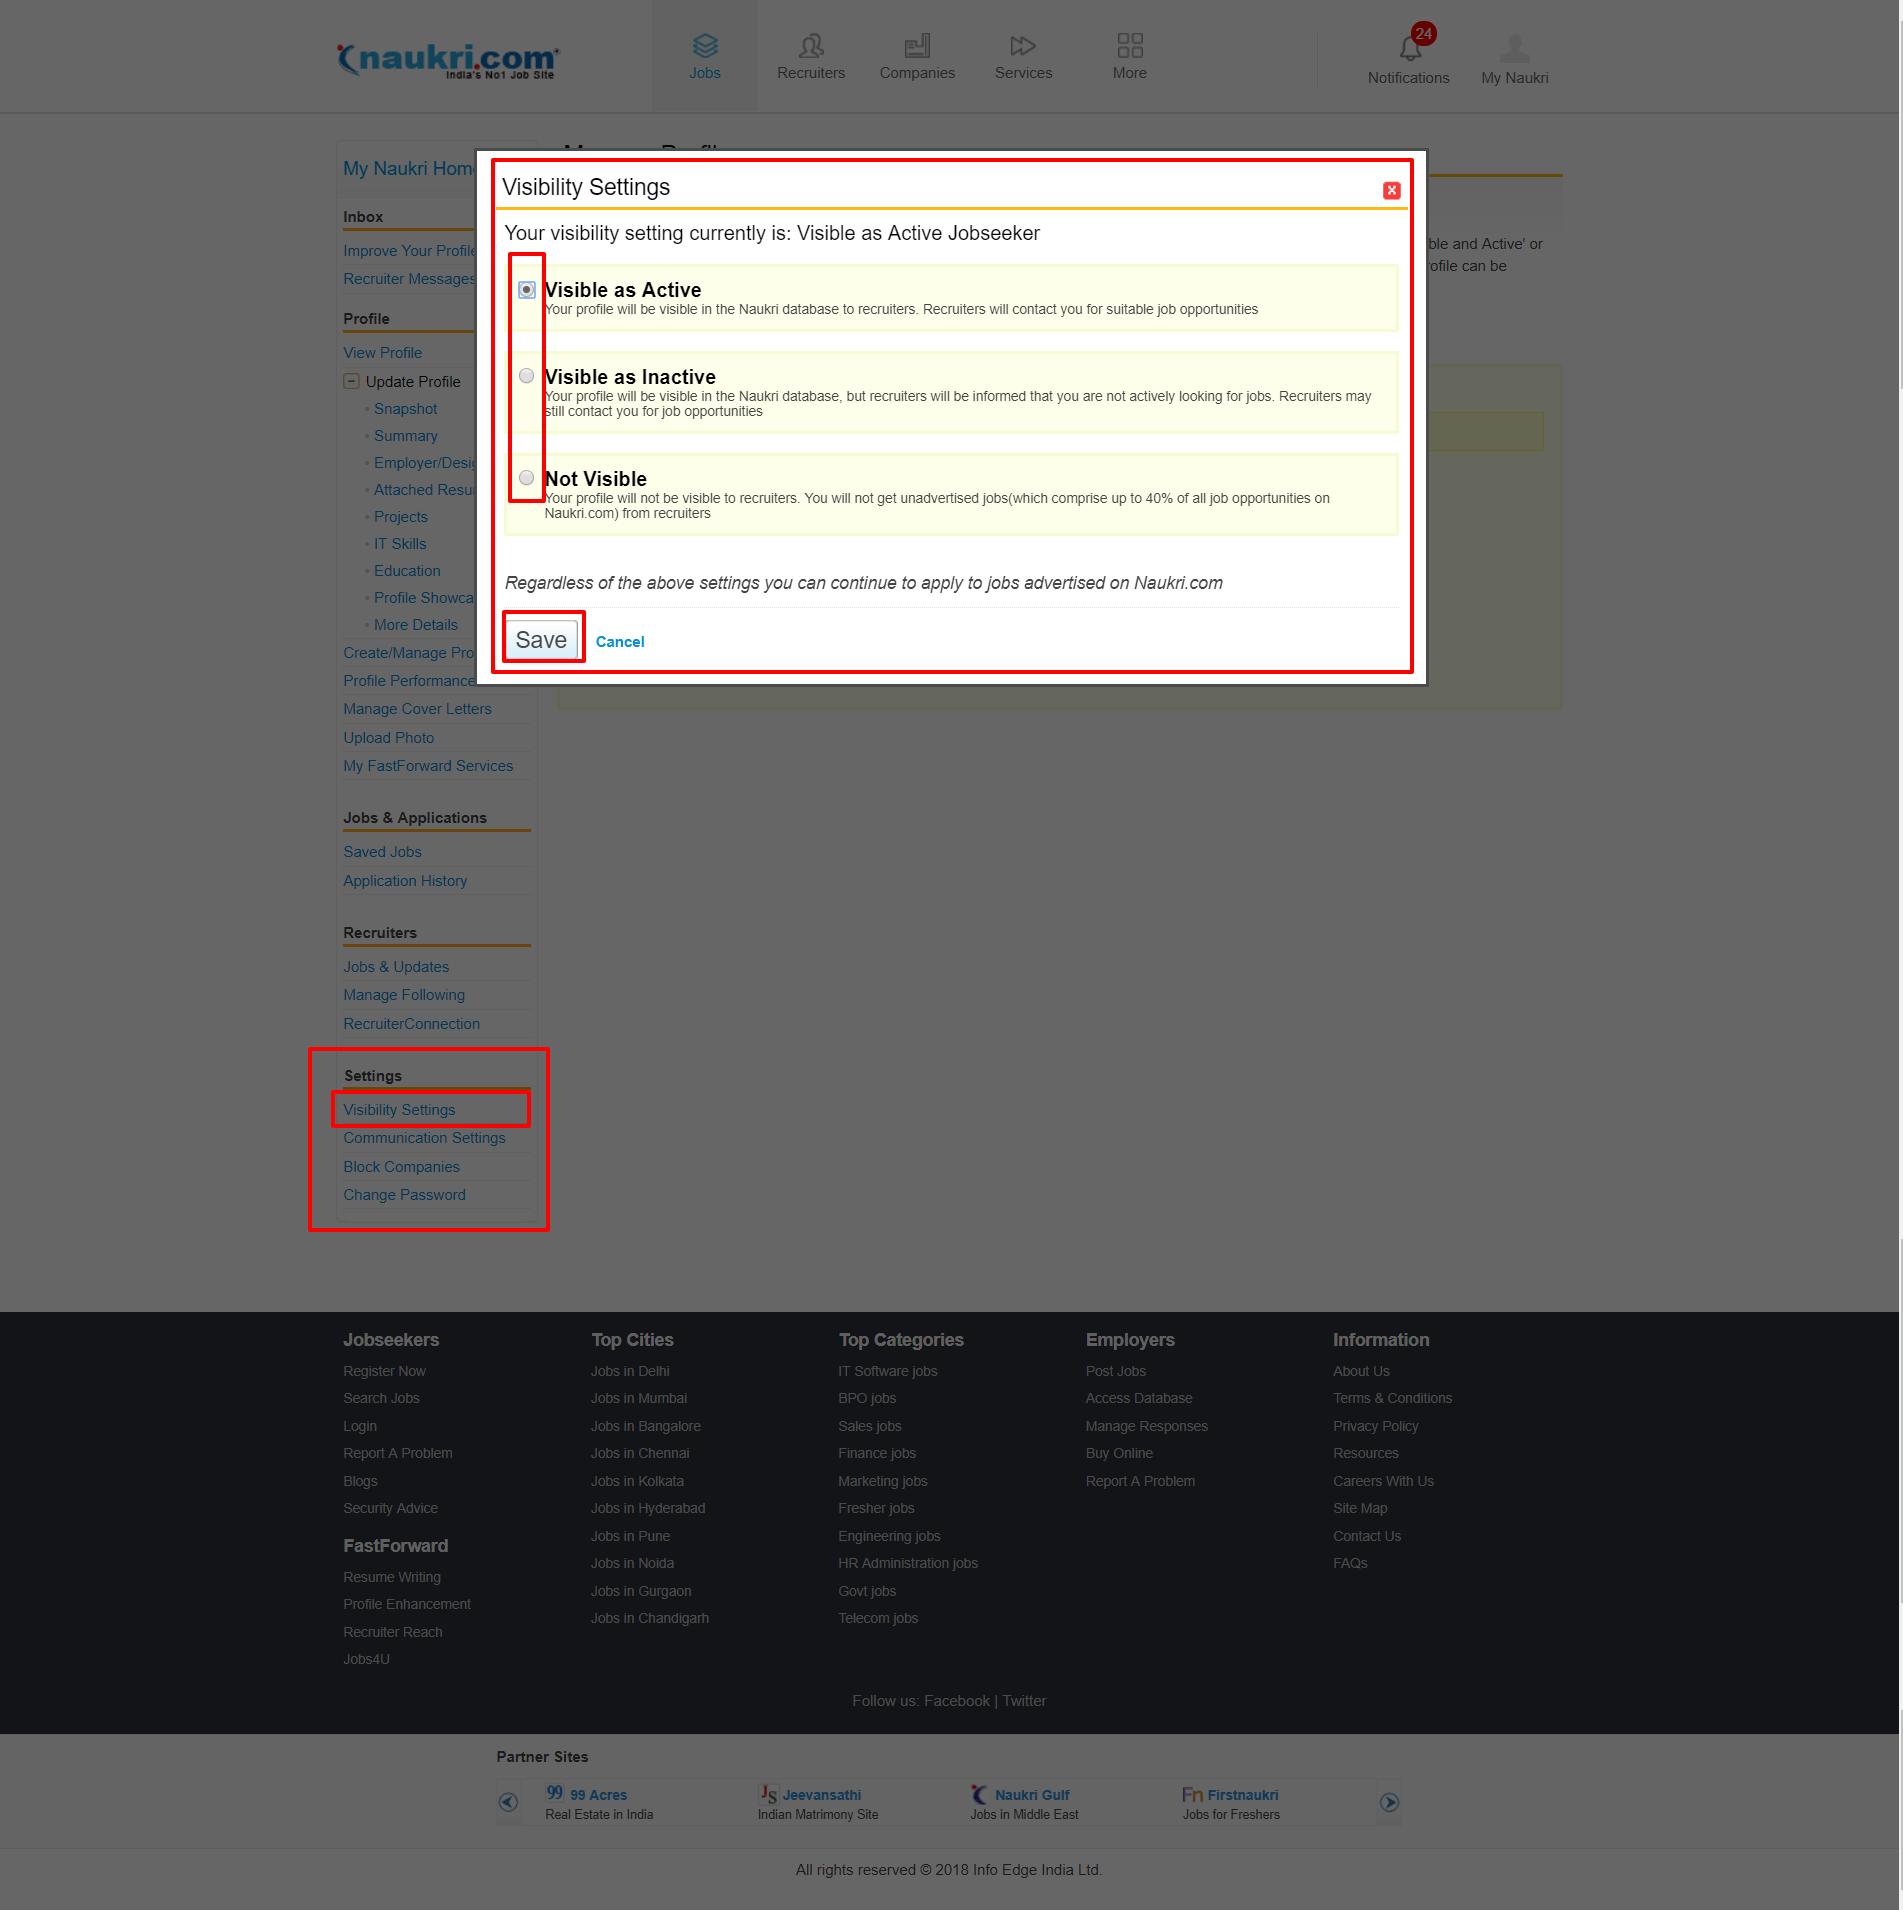 Naukri Profile Manager visibility settings Page